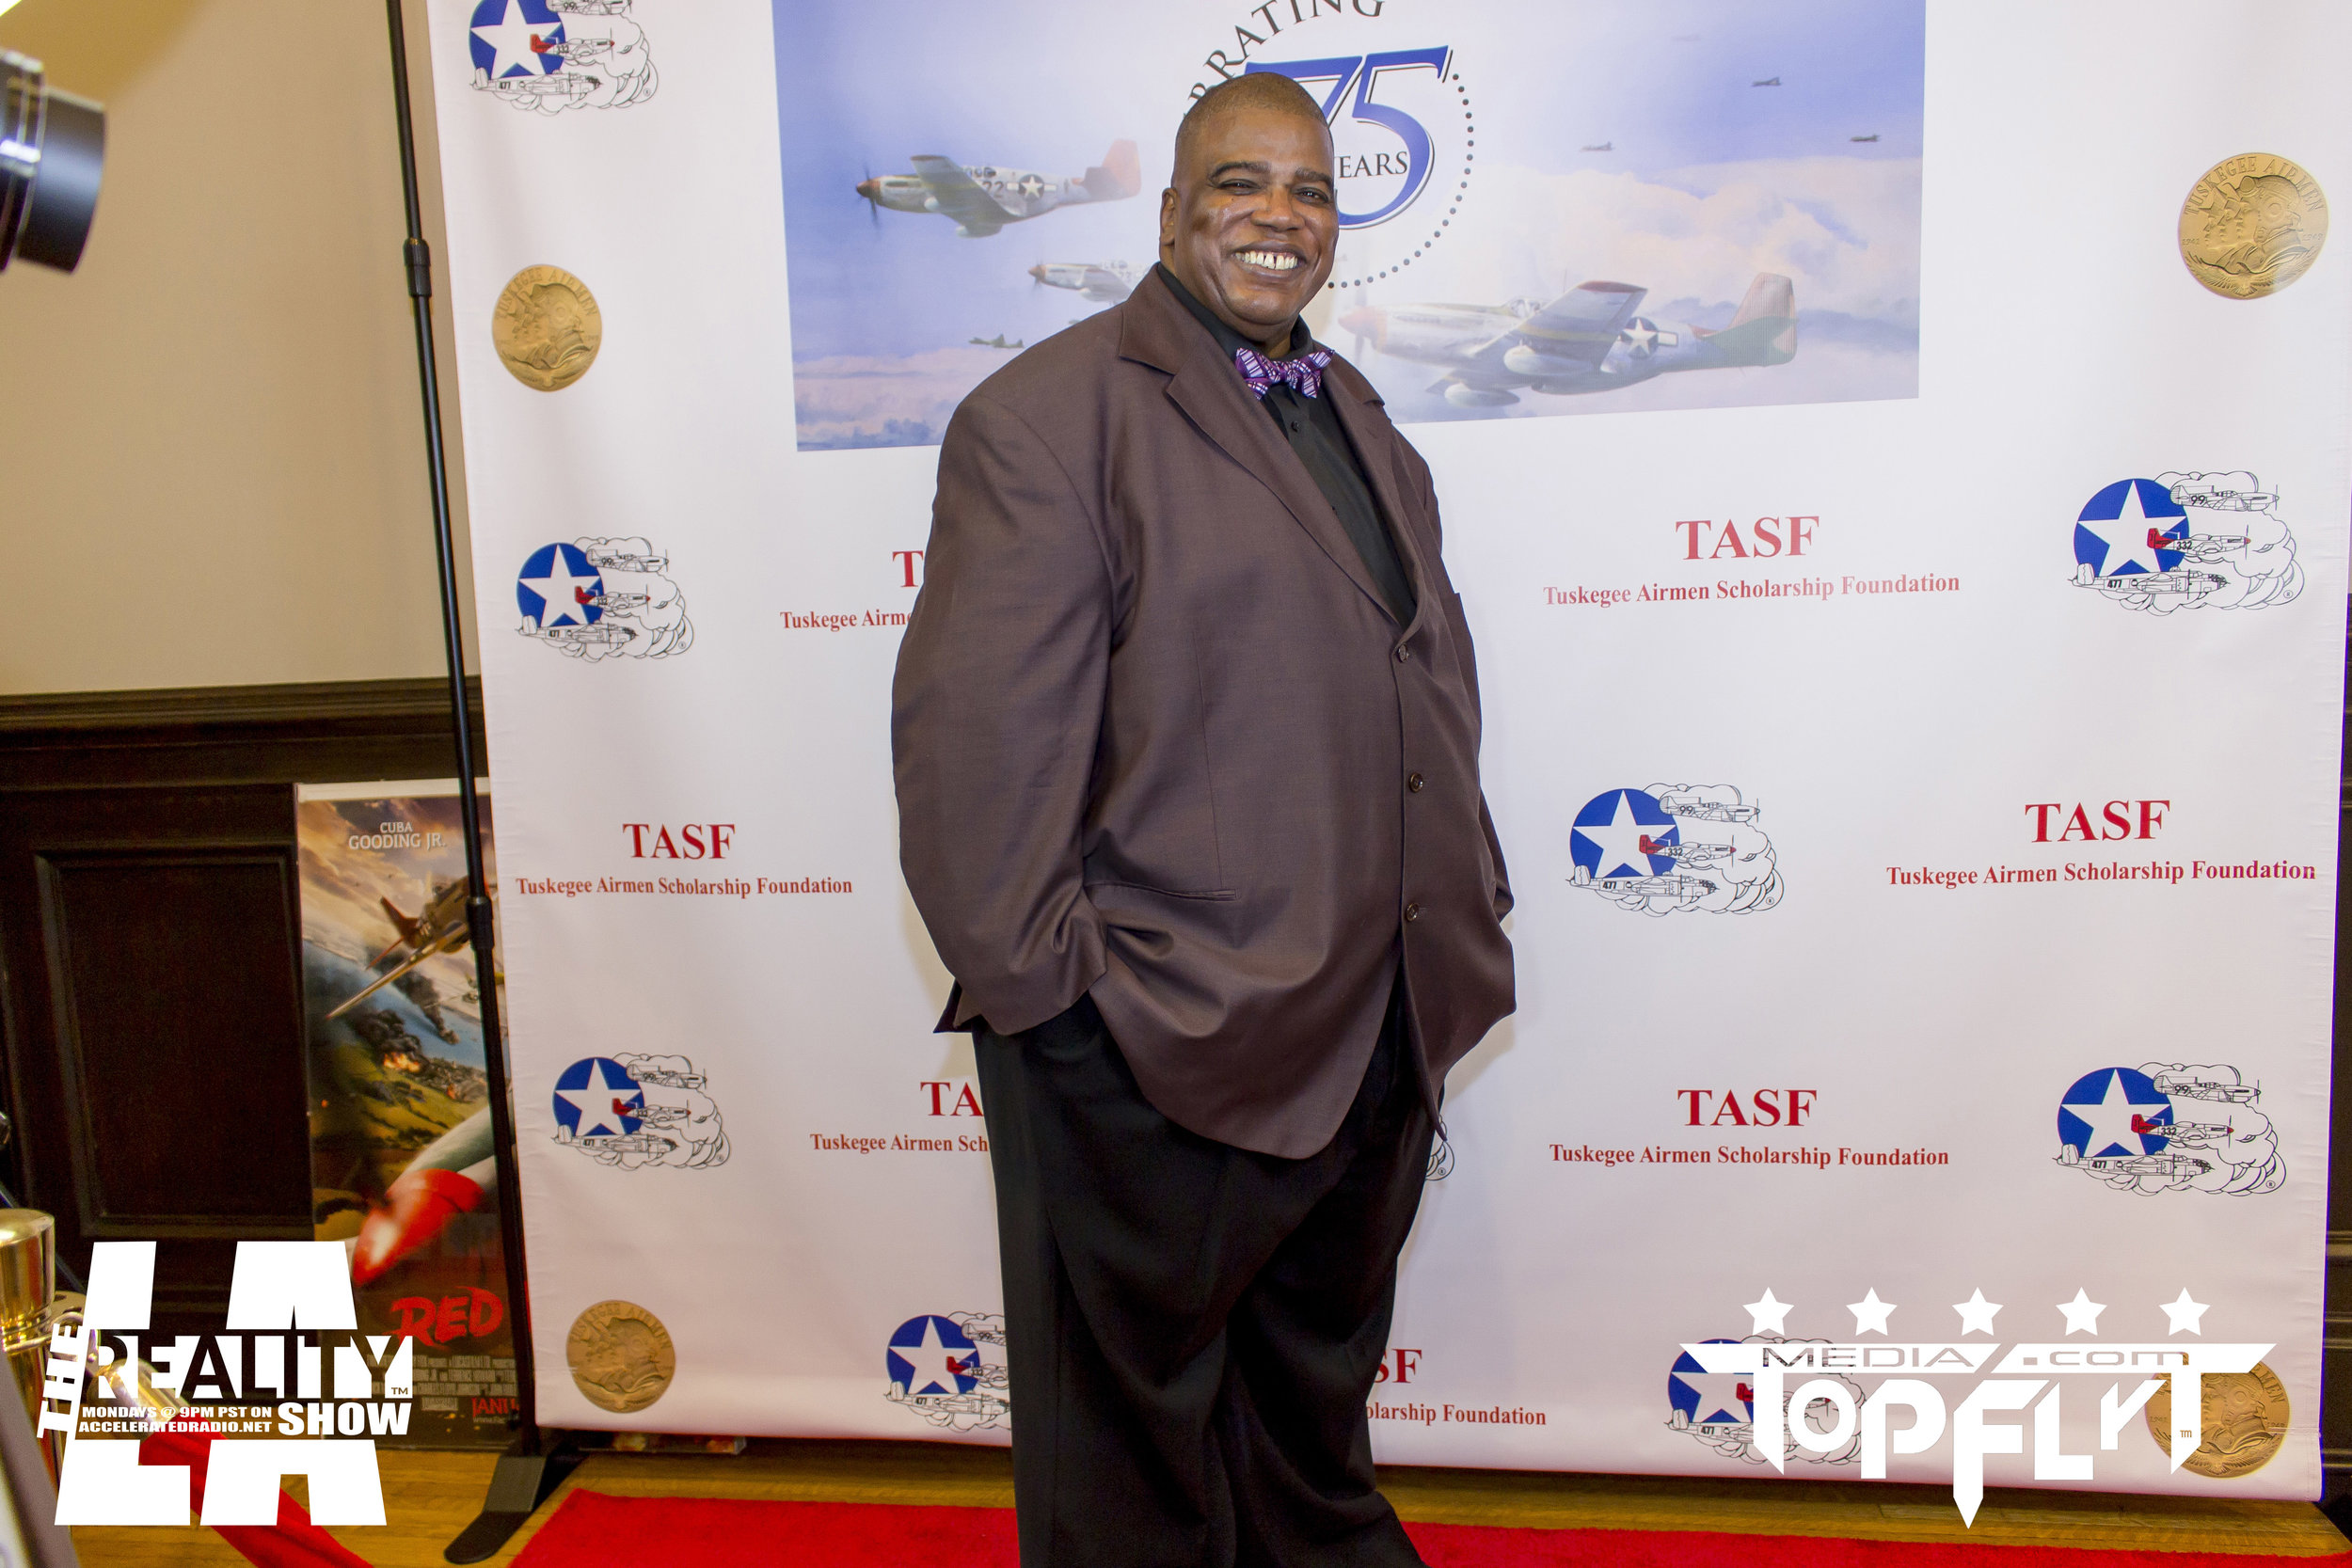 The Reality Show LA - Tuskegee Airmen 75th Anniversary VIP Reception_45.jpg